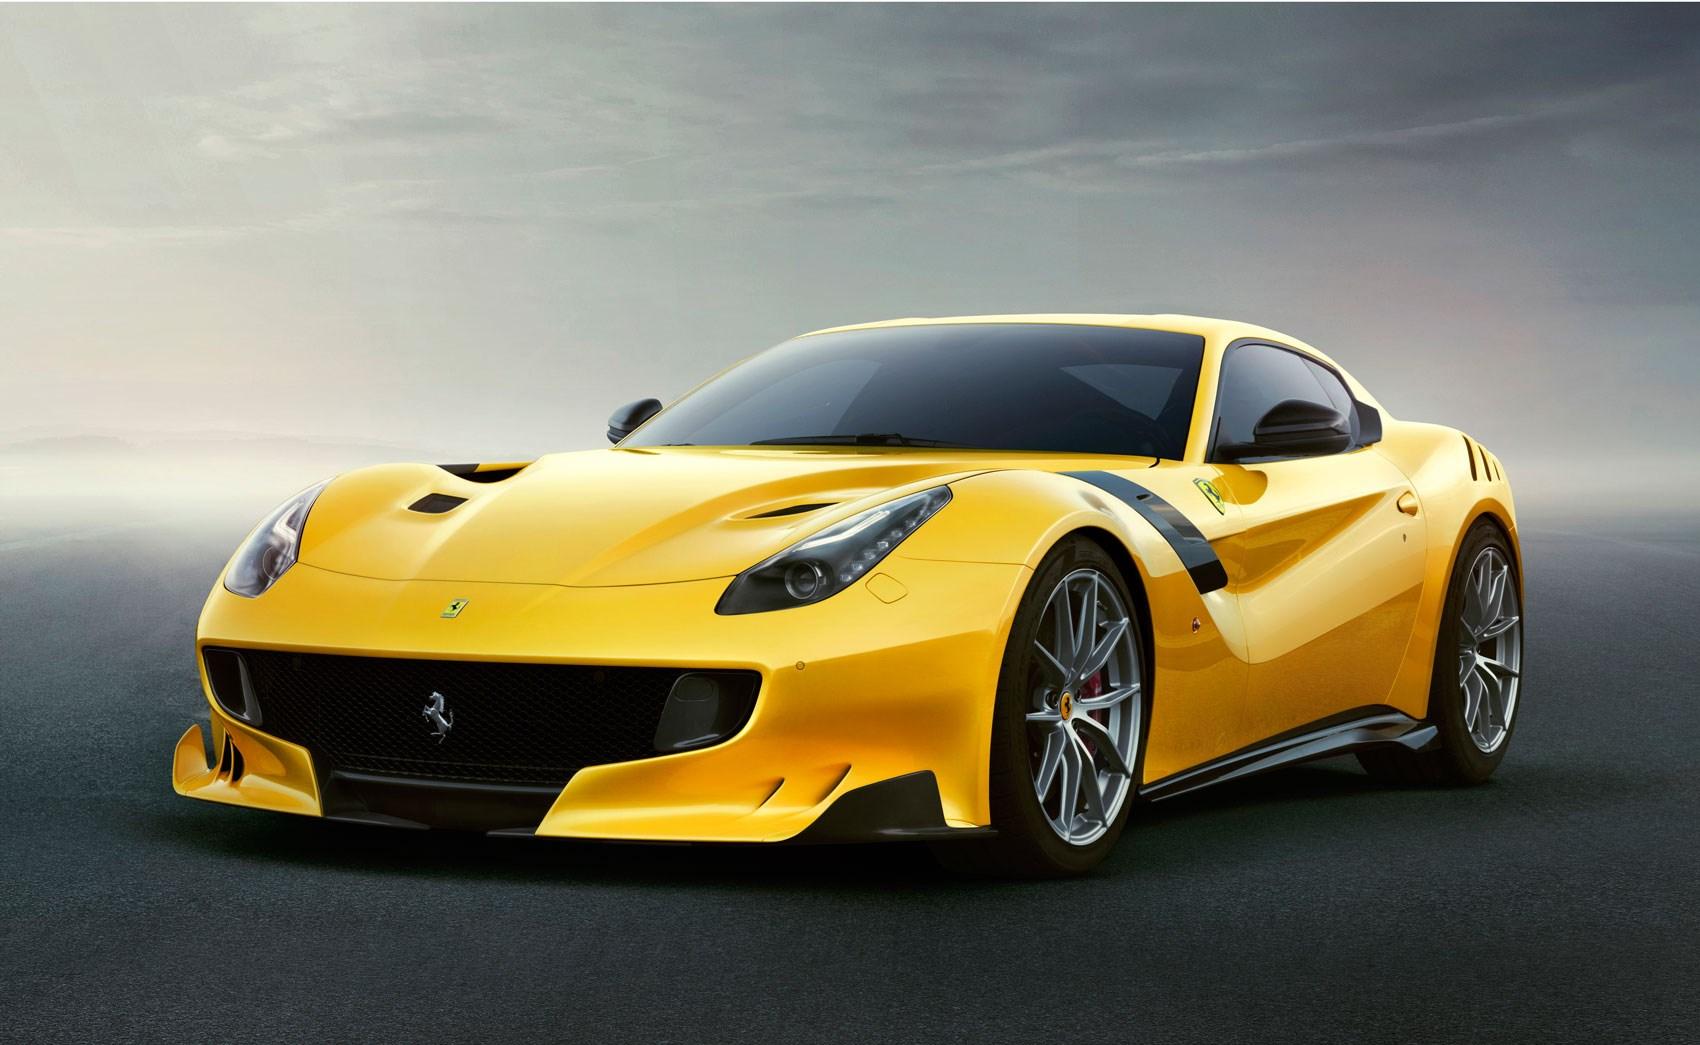 Ferrari Shows Off The New F12 Tdf Carsalesbase Com